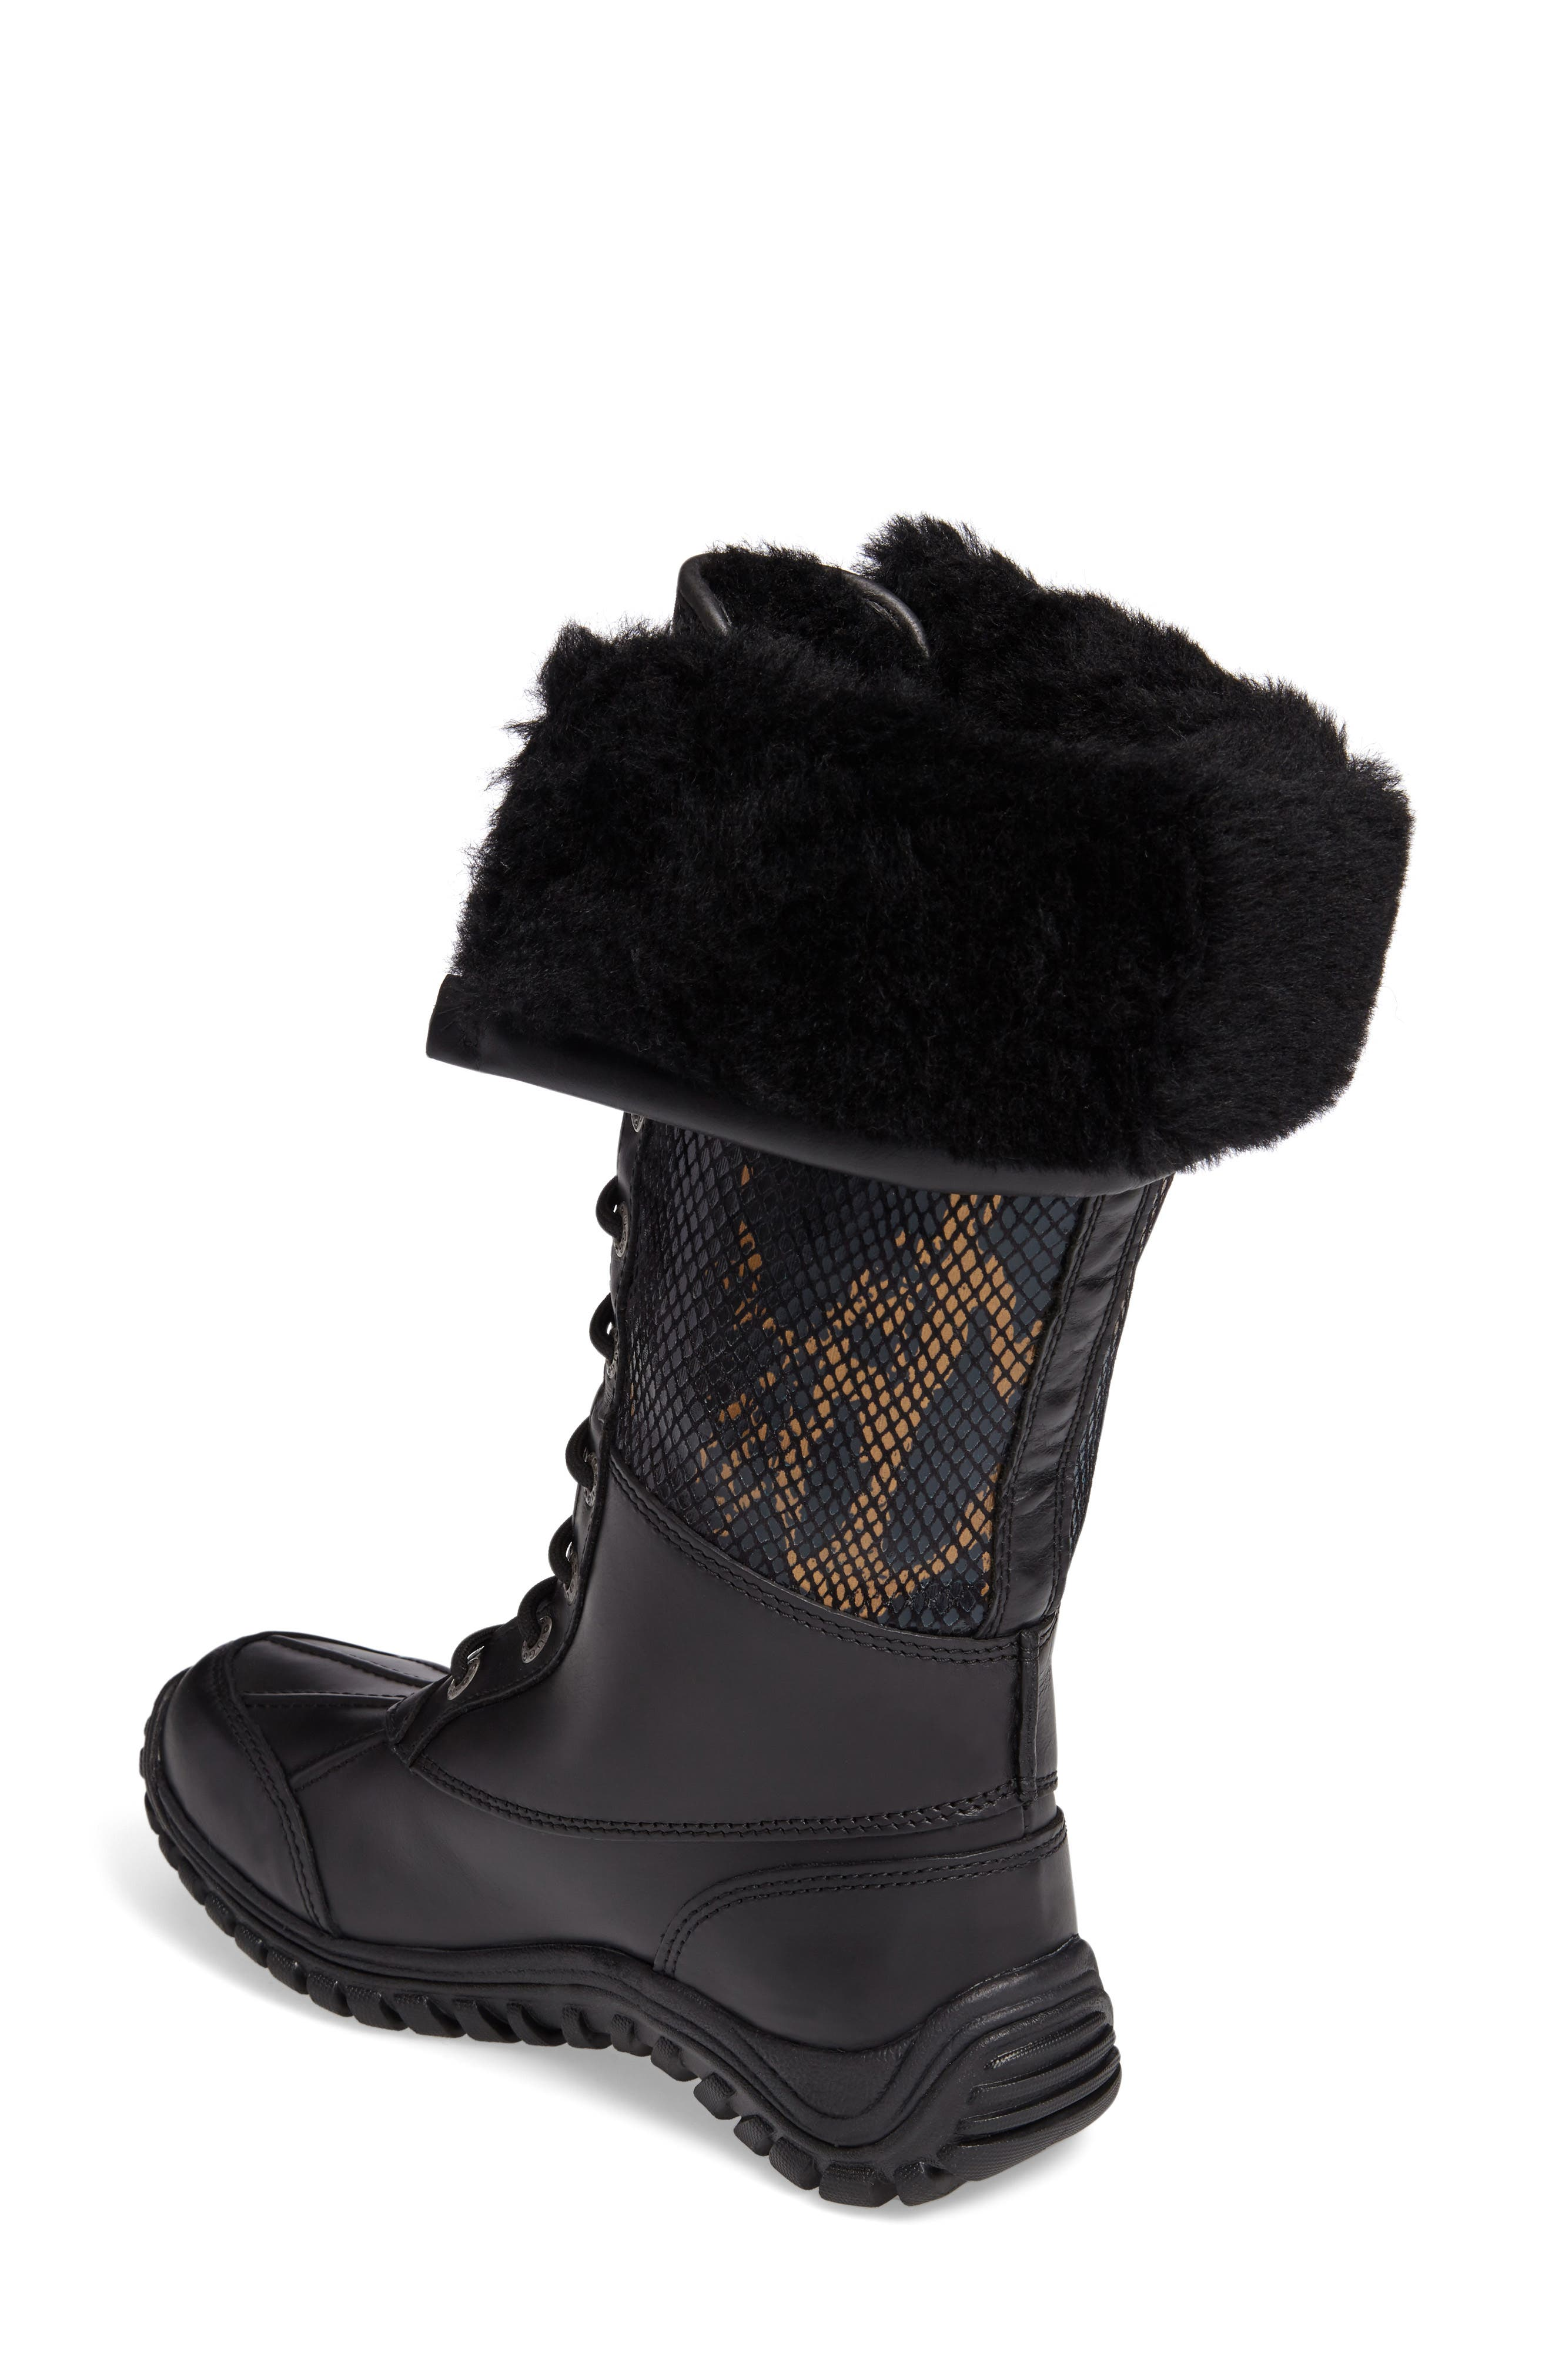 Alternate Image 2  - UGG® Adirondack Tall Exotic Velvet Waterproof Winter Boot (Women)